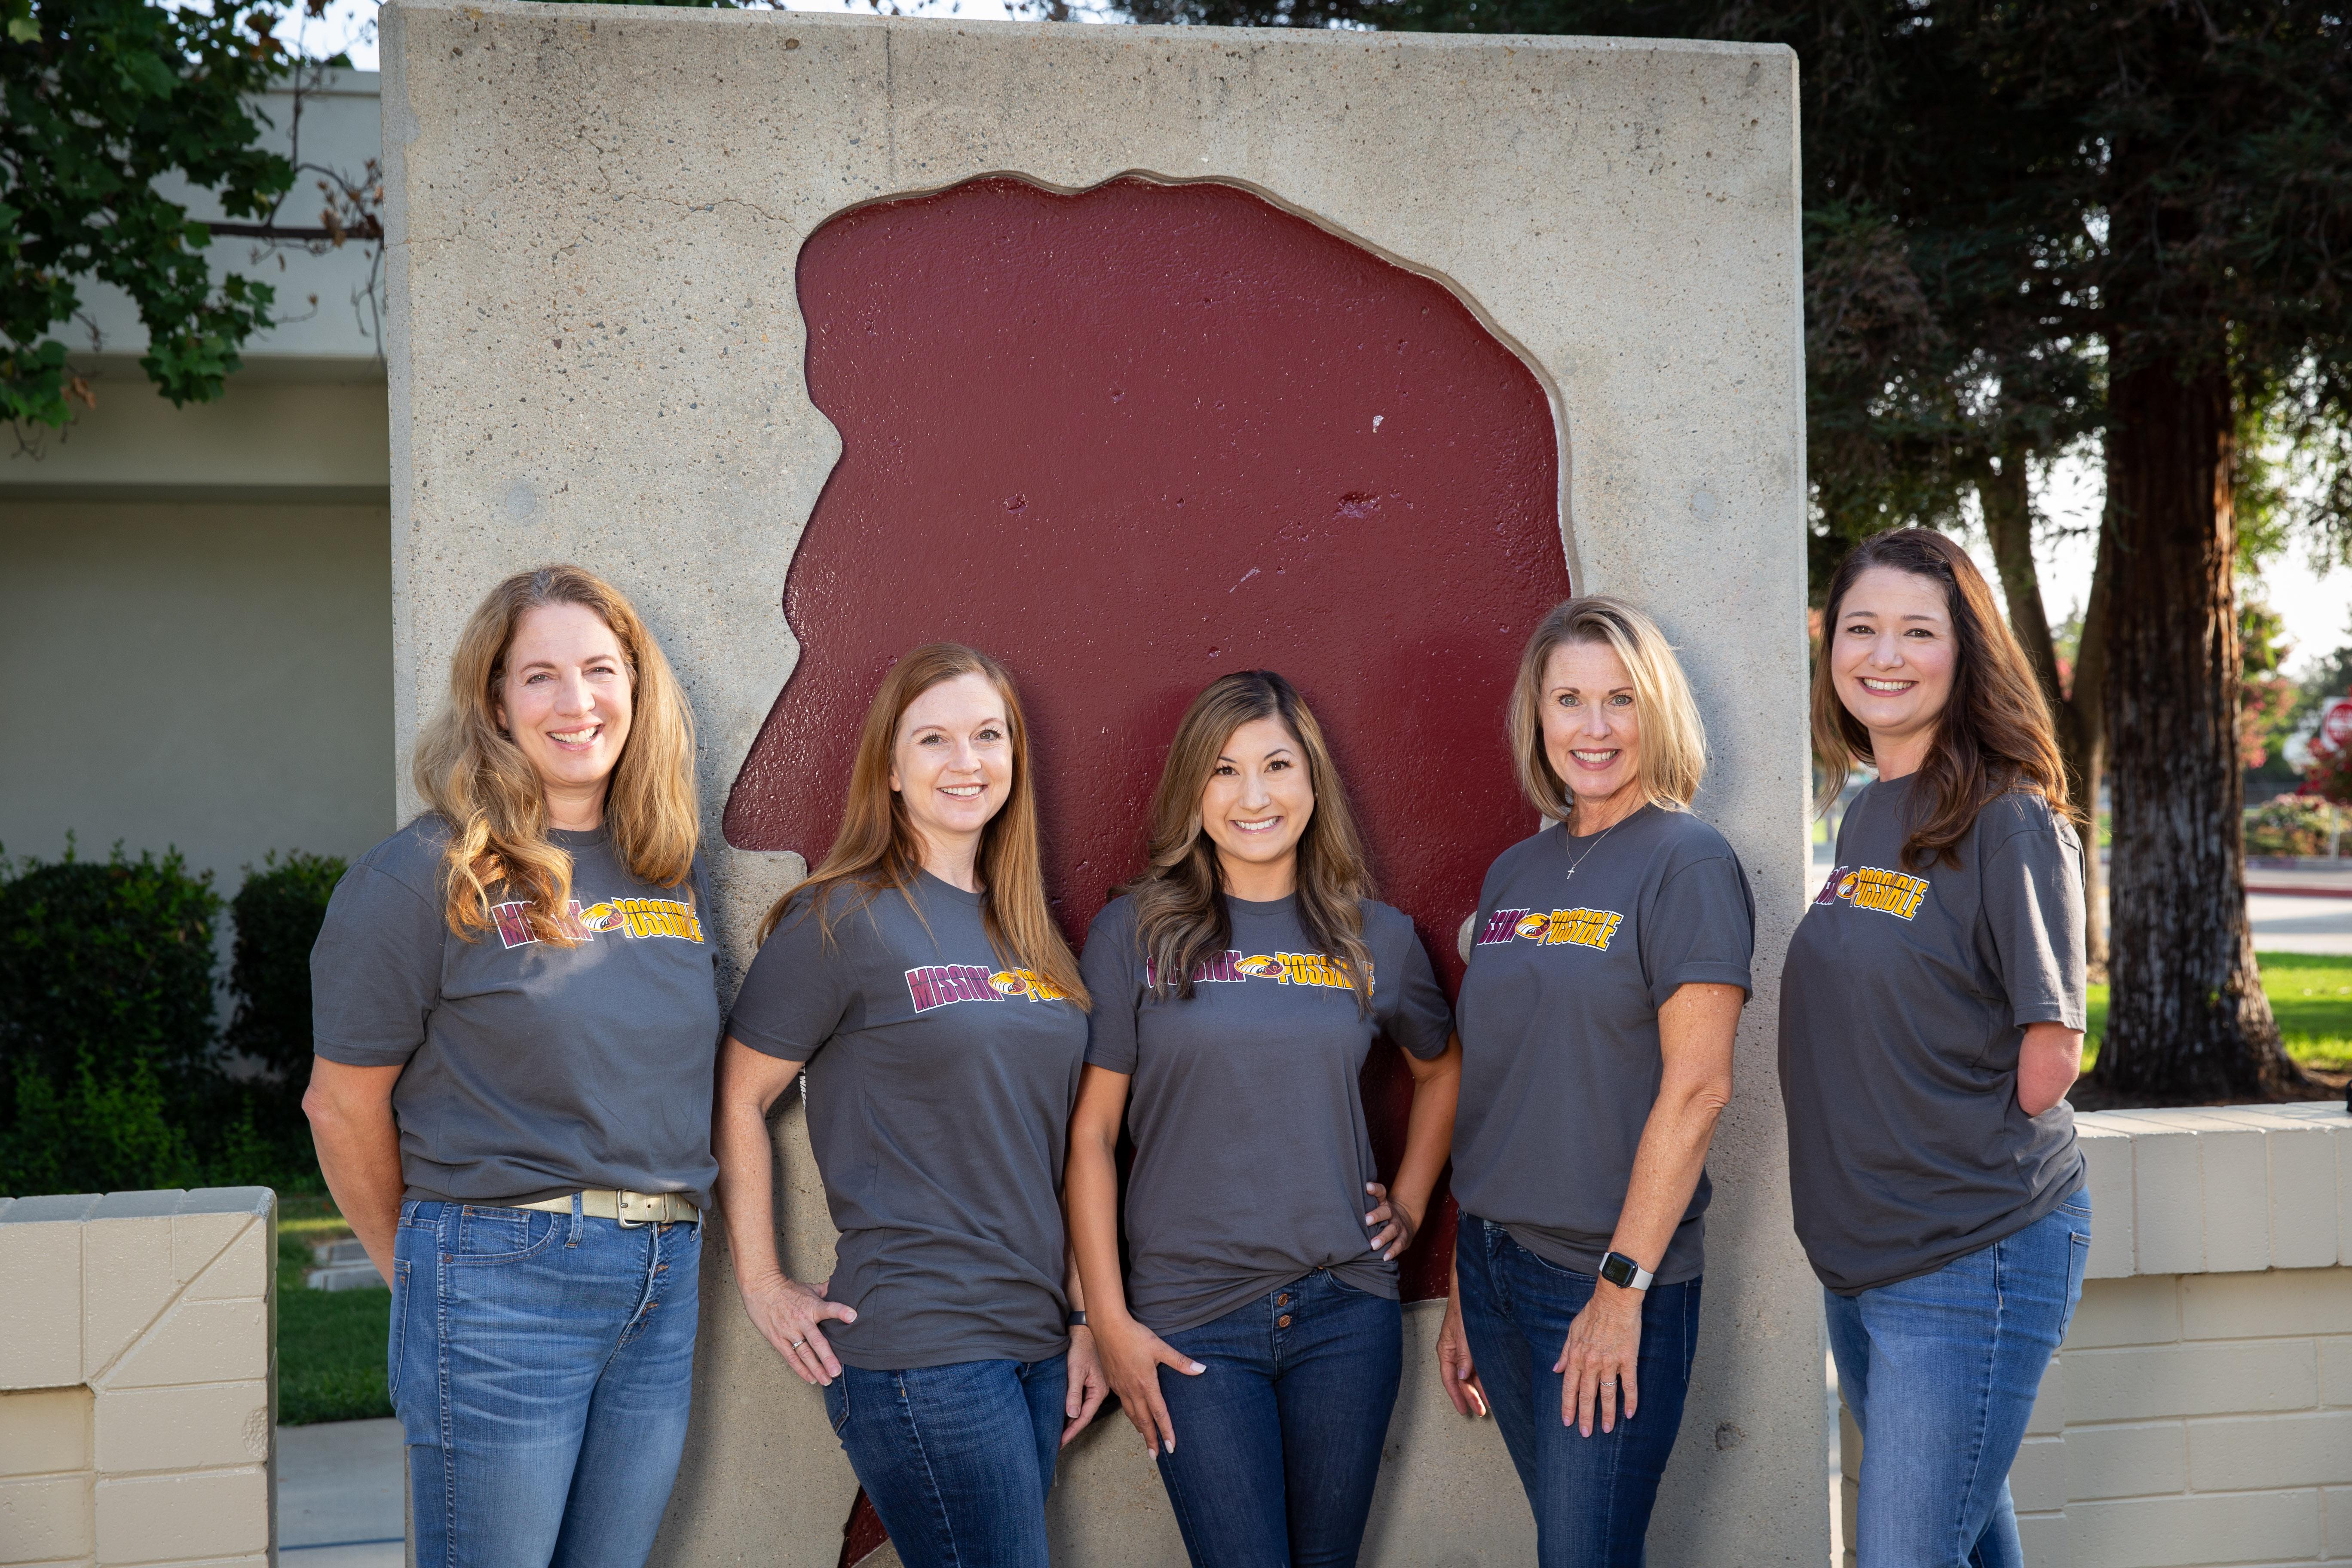 First grade teachers Sherri Rinehart, Laura Cook, Rachel Richards, Melissa Howard, and Jenny Chavera